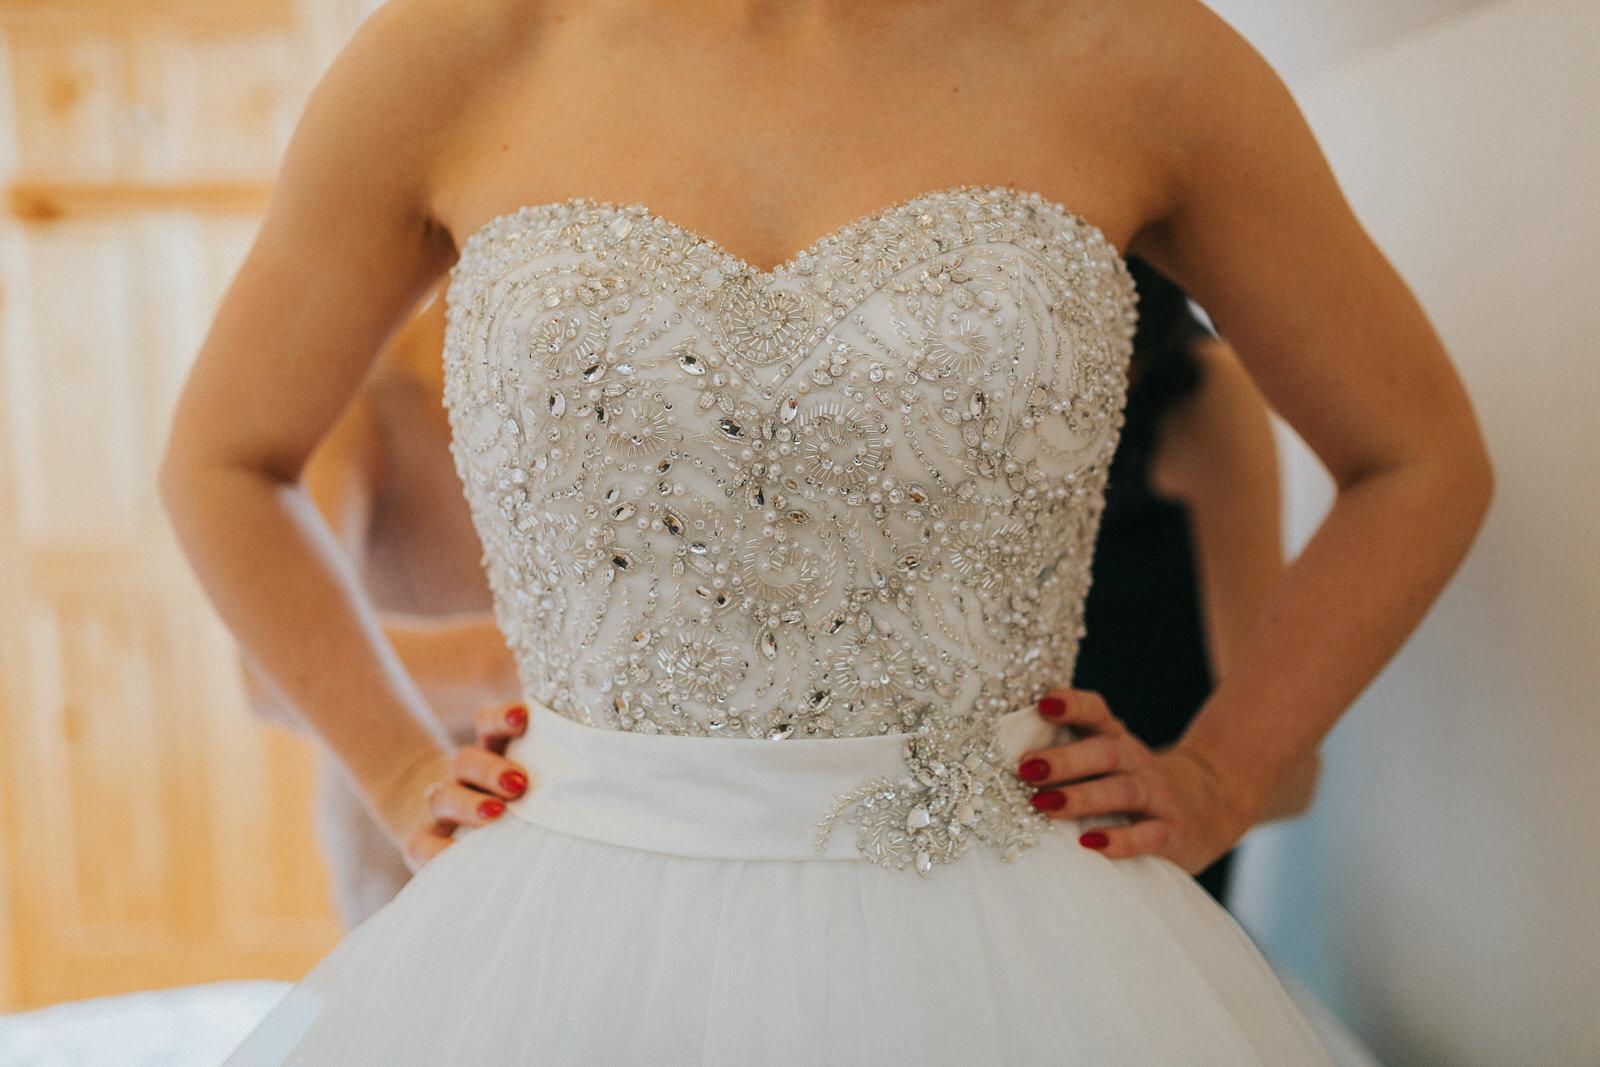 Clonabreany_wedding-photographer_roger_kenny_ireland_016.jpg